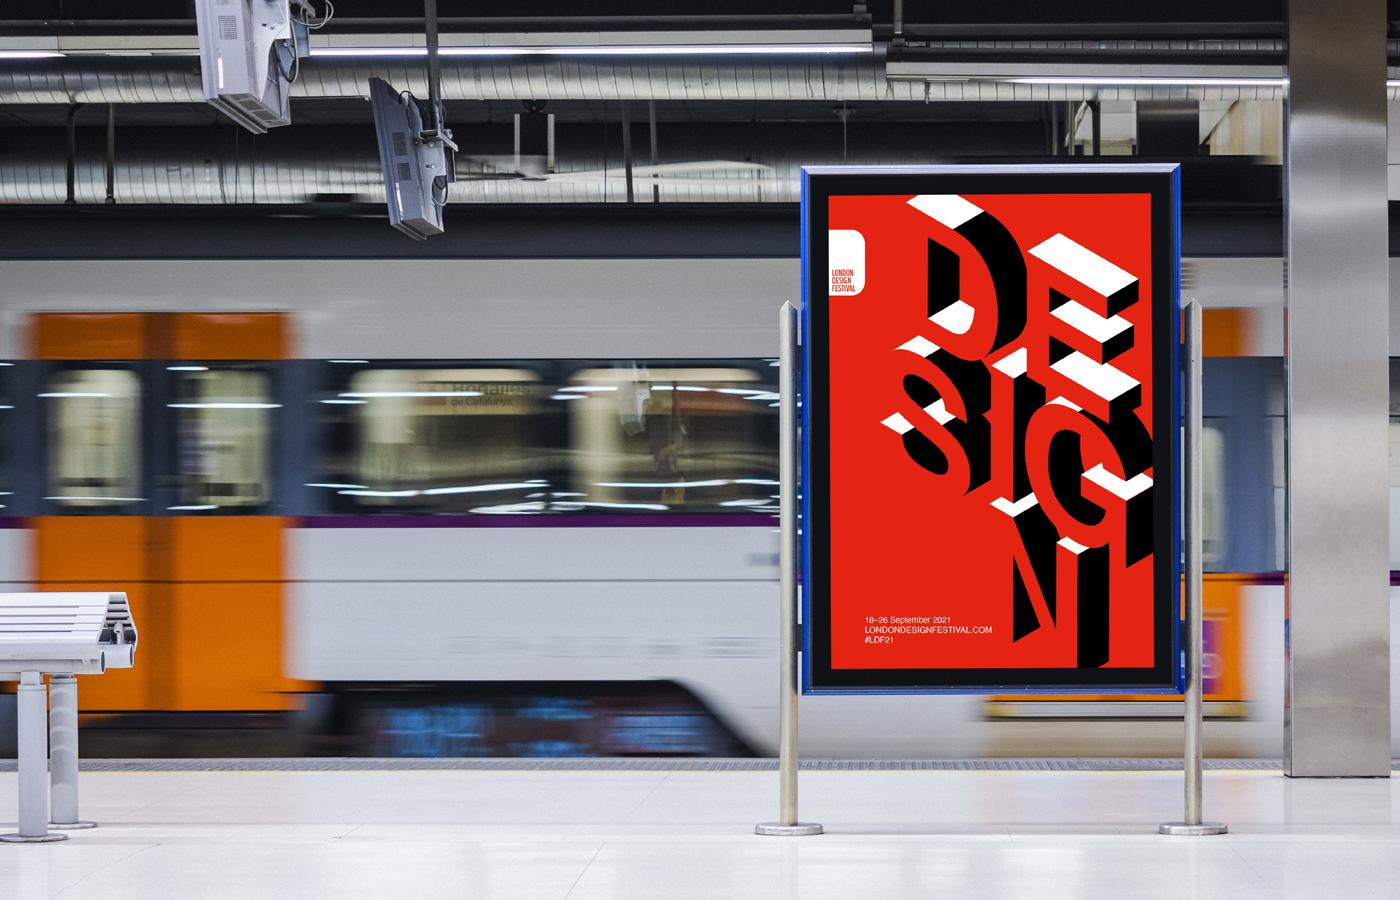 London Design Festival celebra y promueve Londres como la capital mundial del diseño.